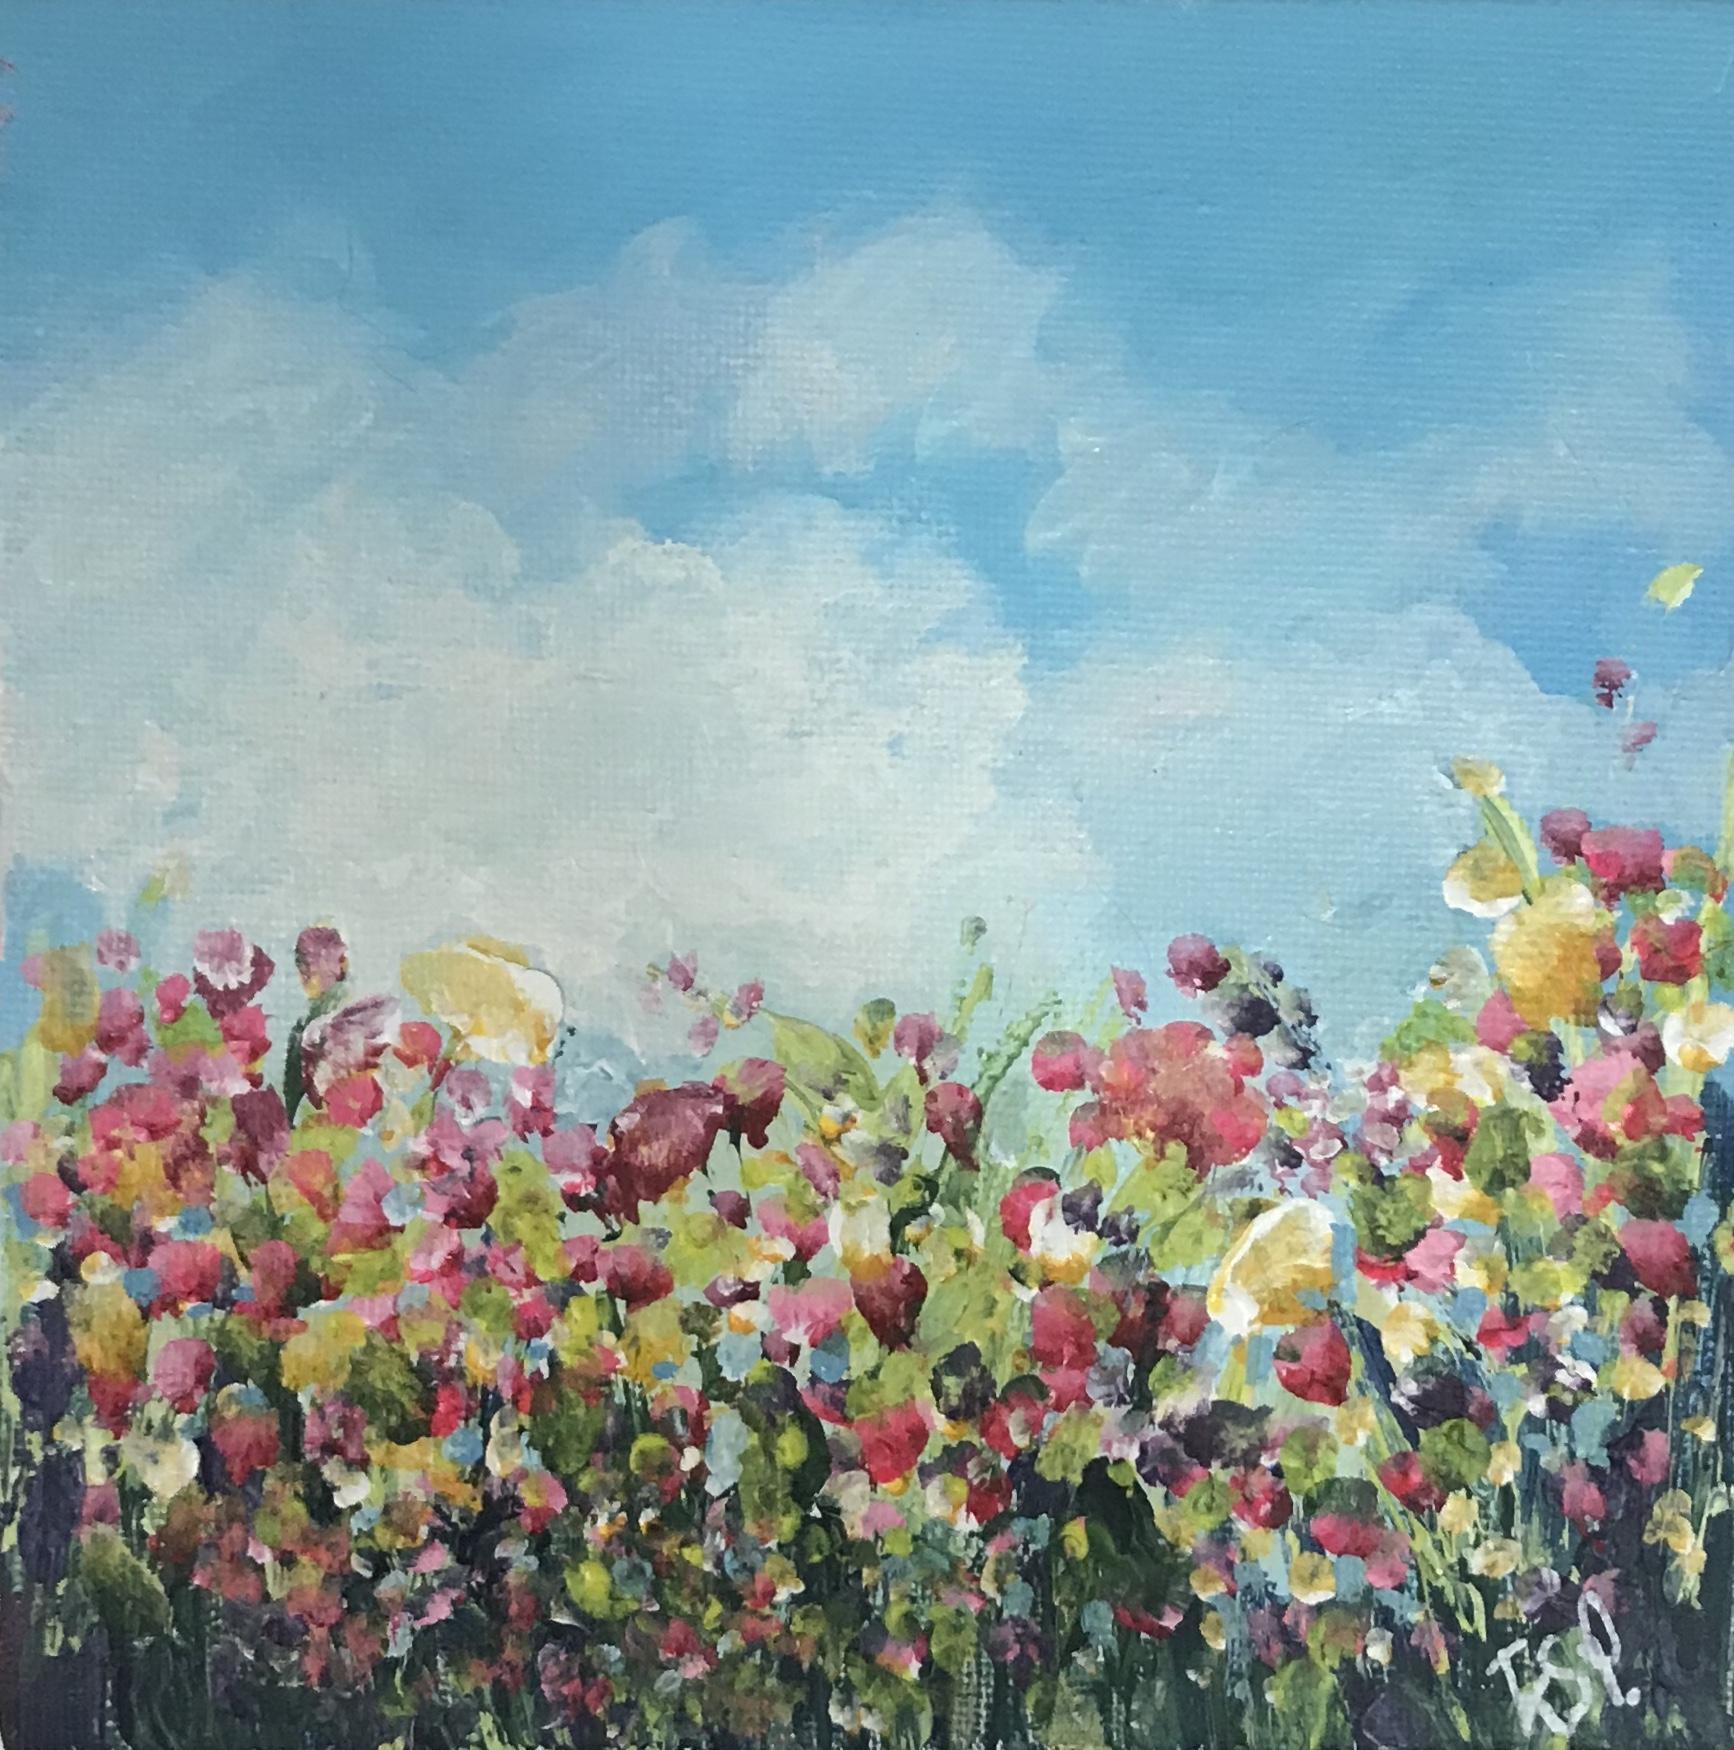 Flowering beneath the sky